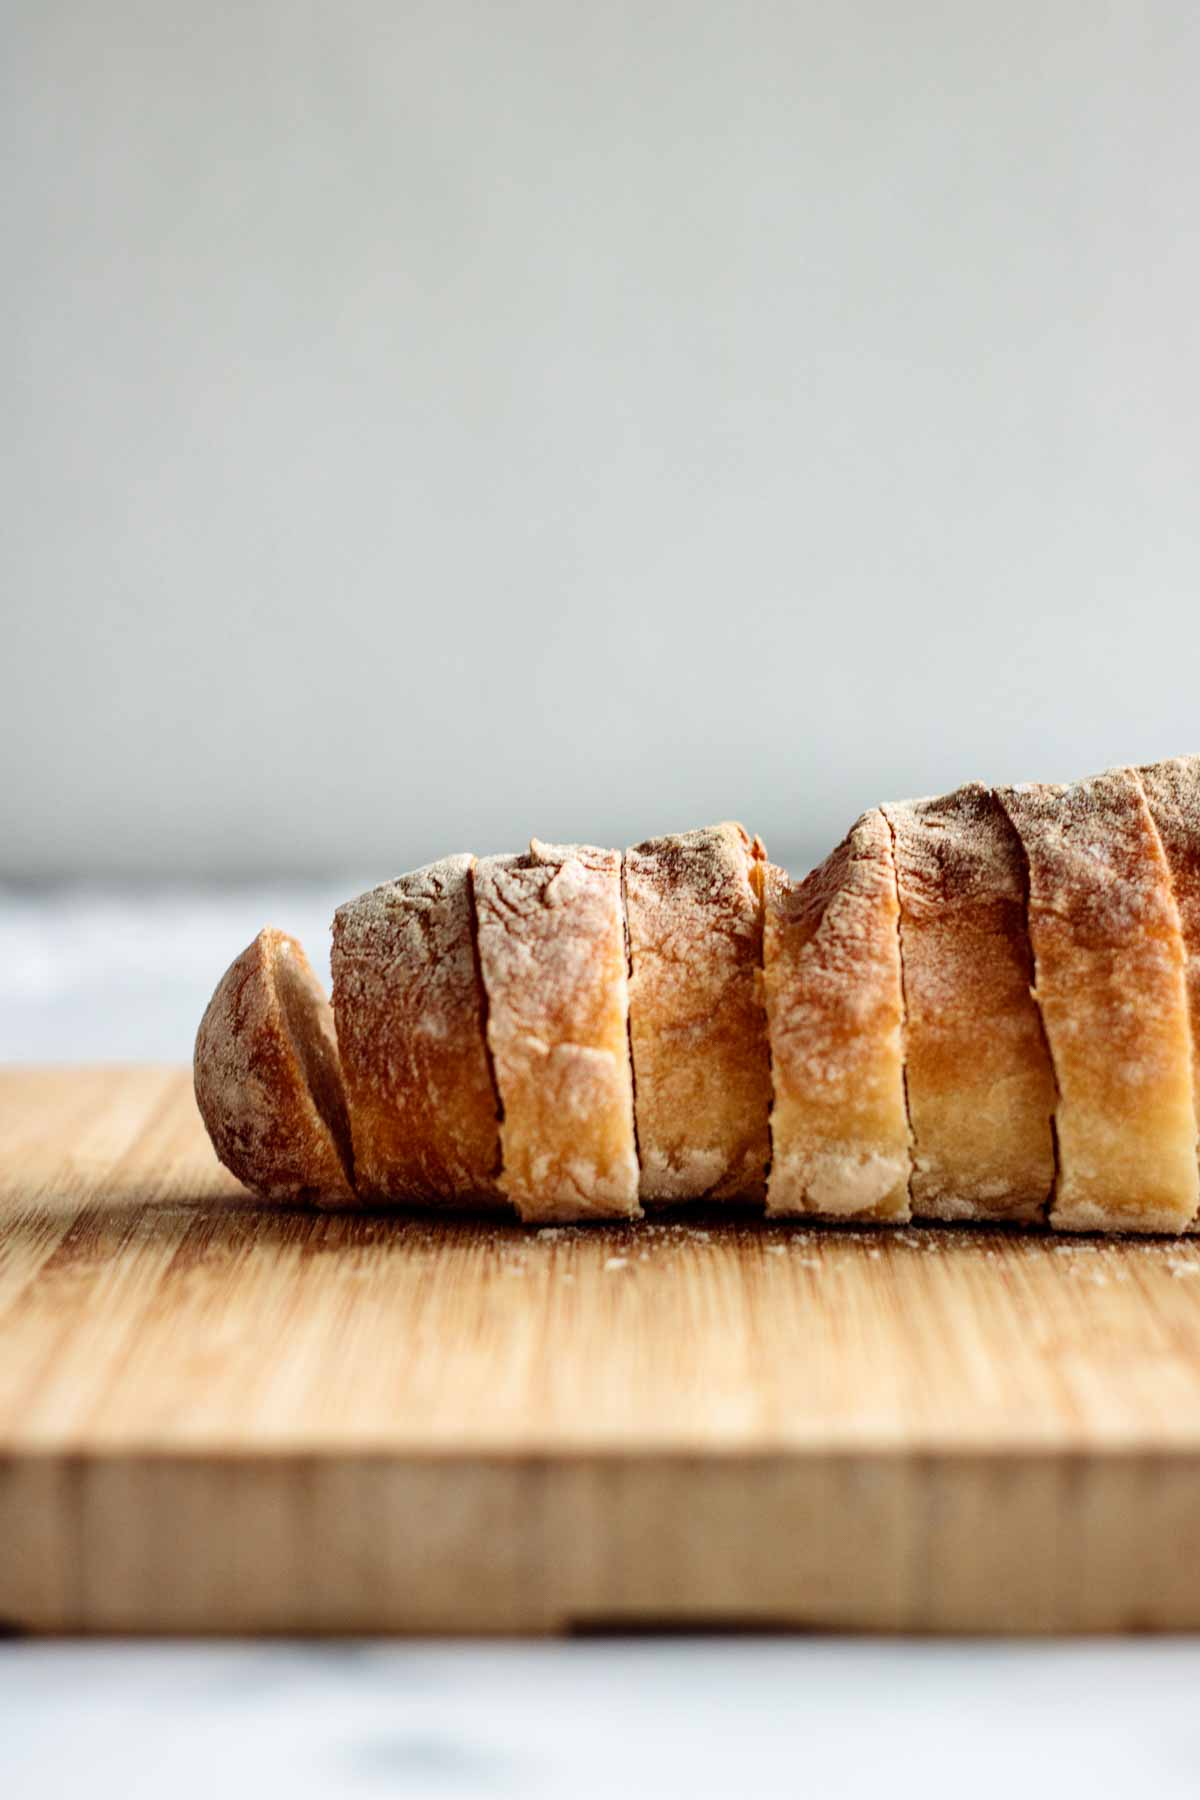 A baguette bread, sliced.